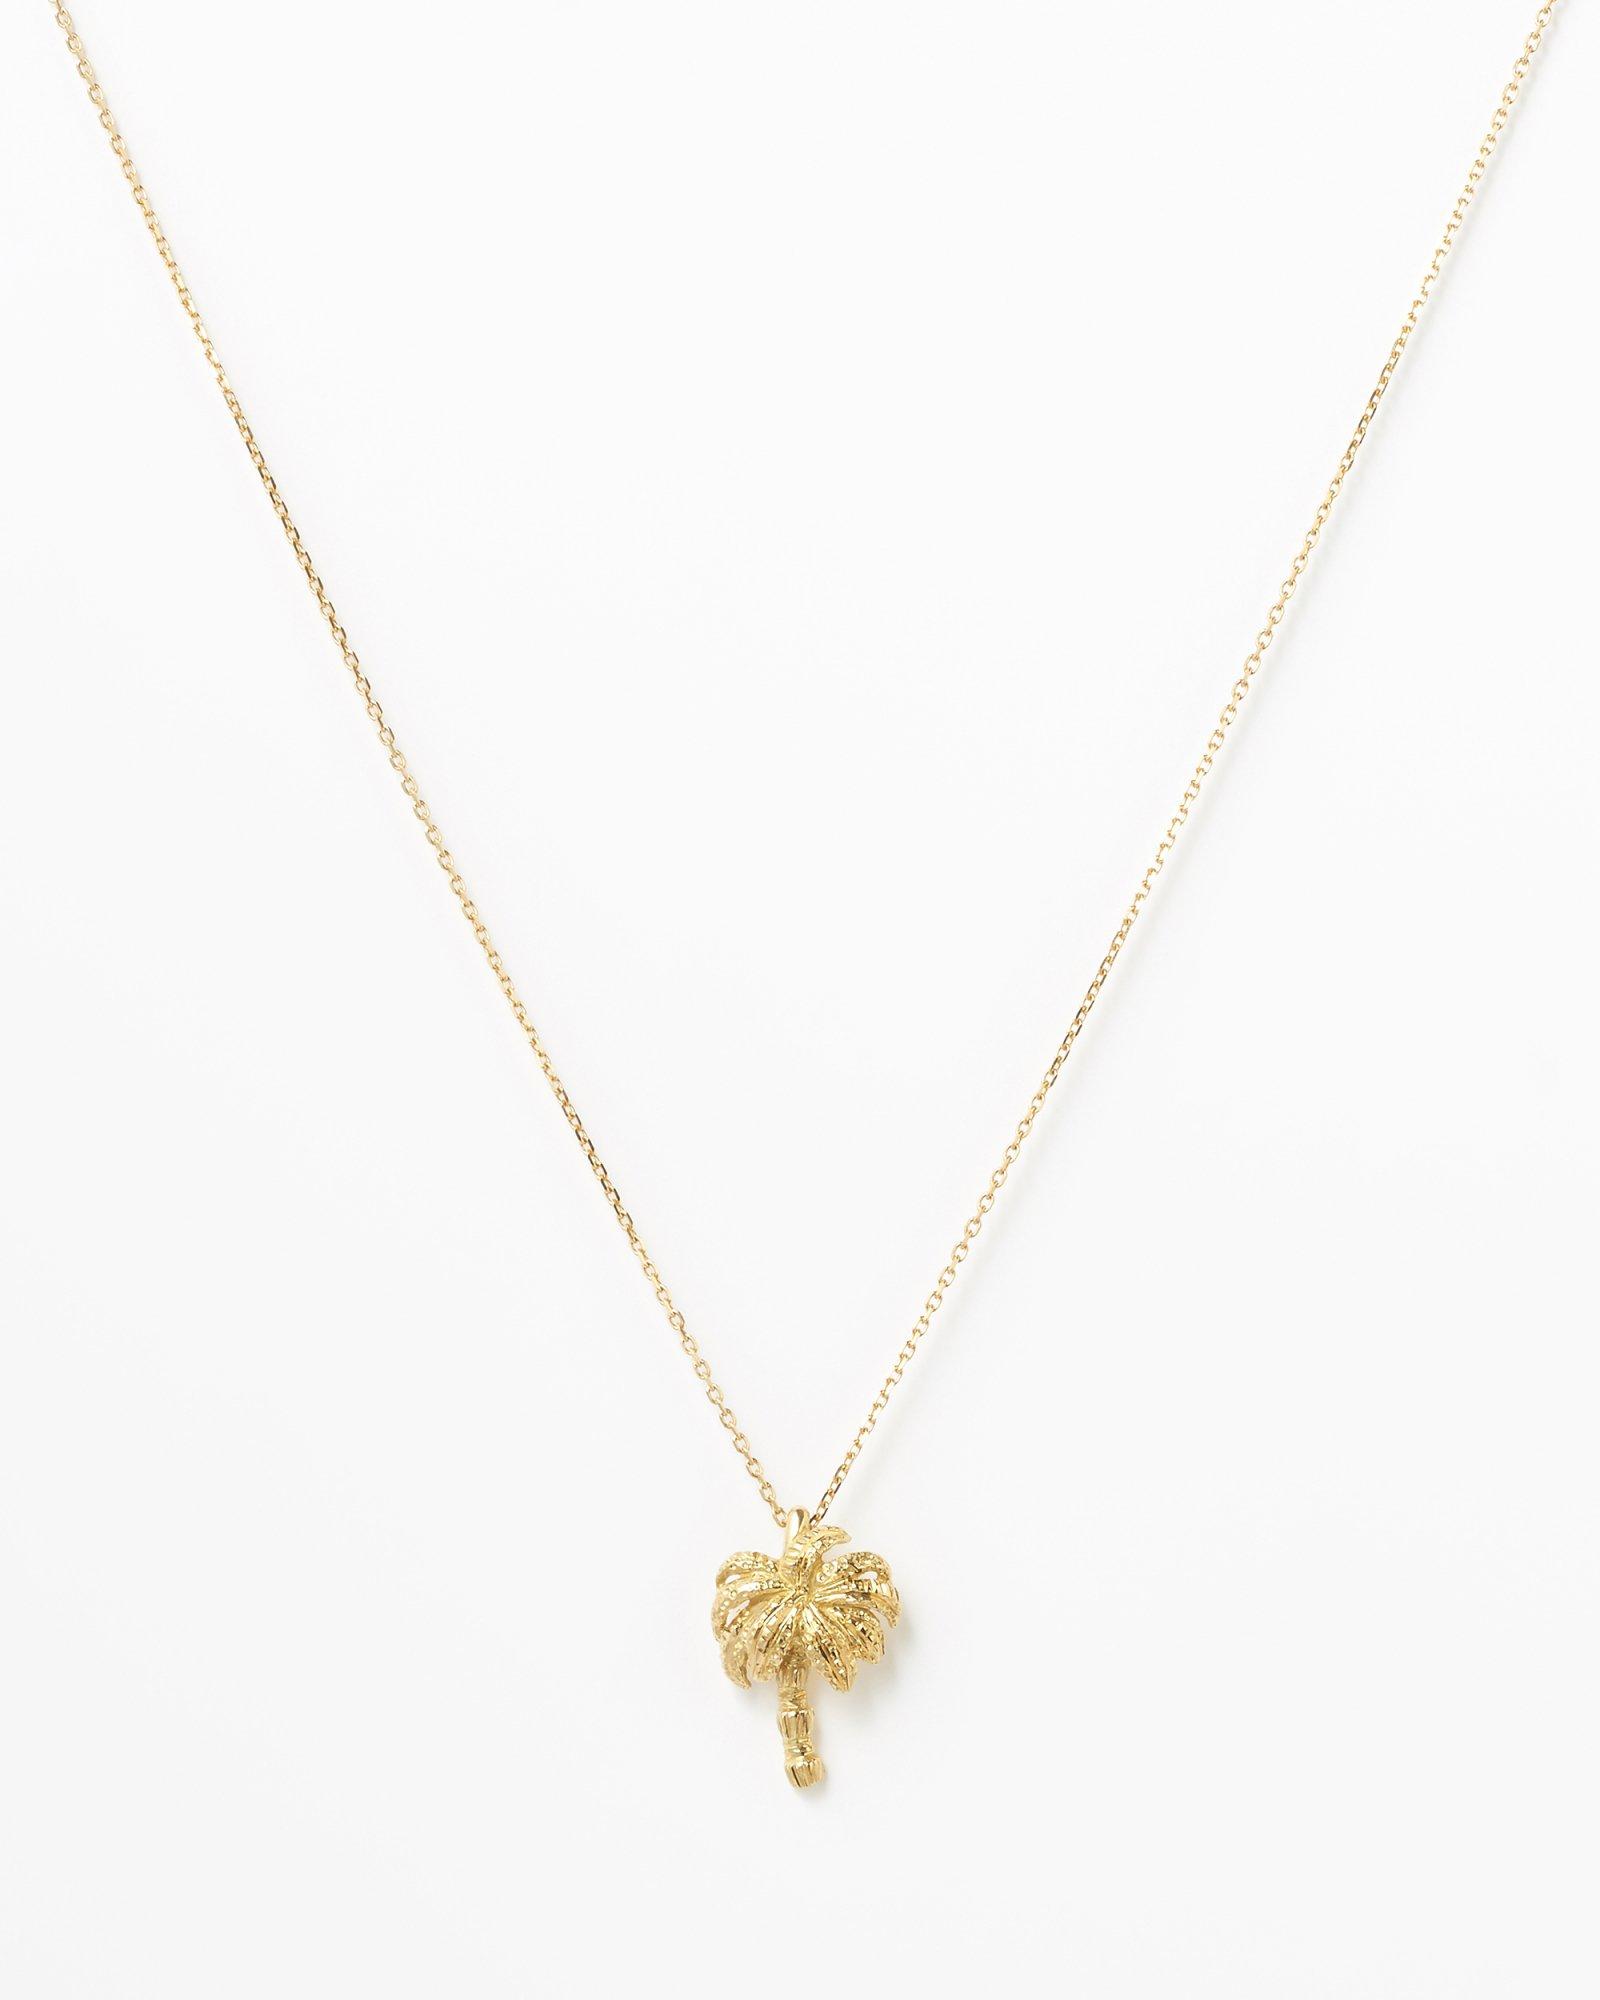 HISPANIA / Palm tree necklace